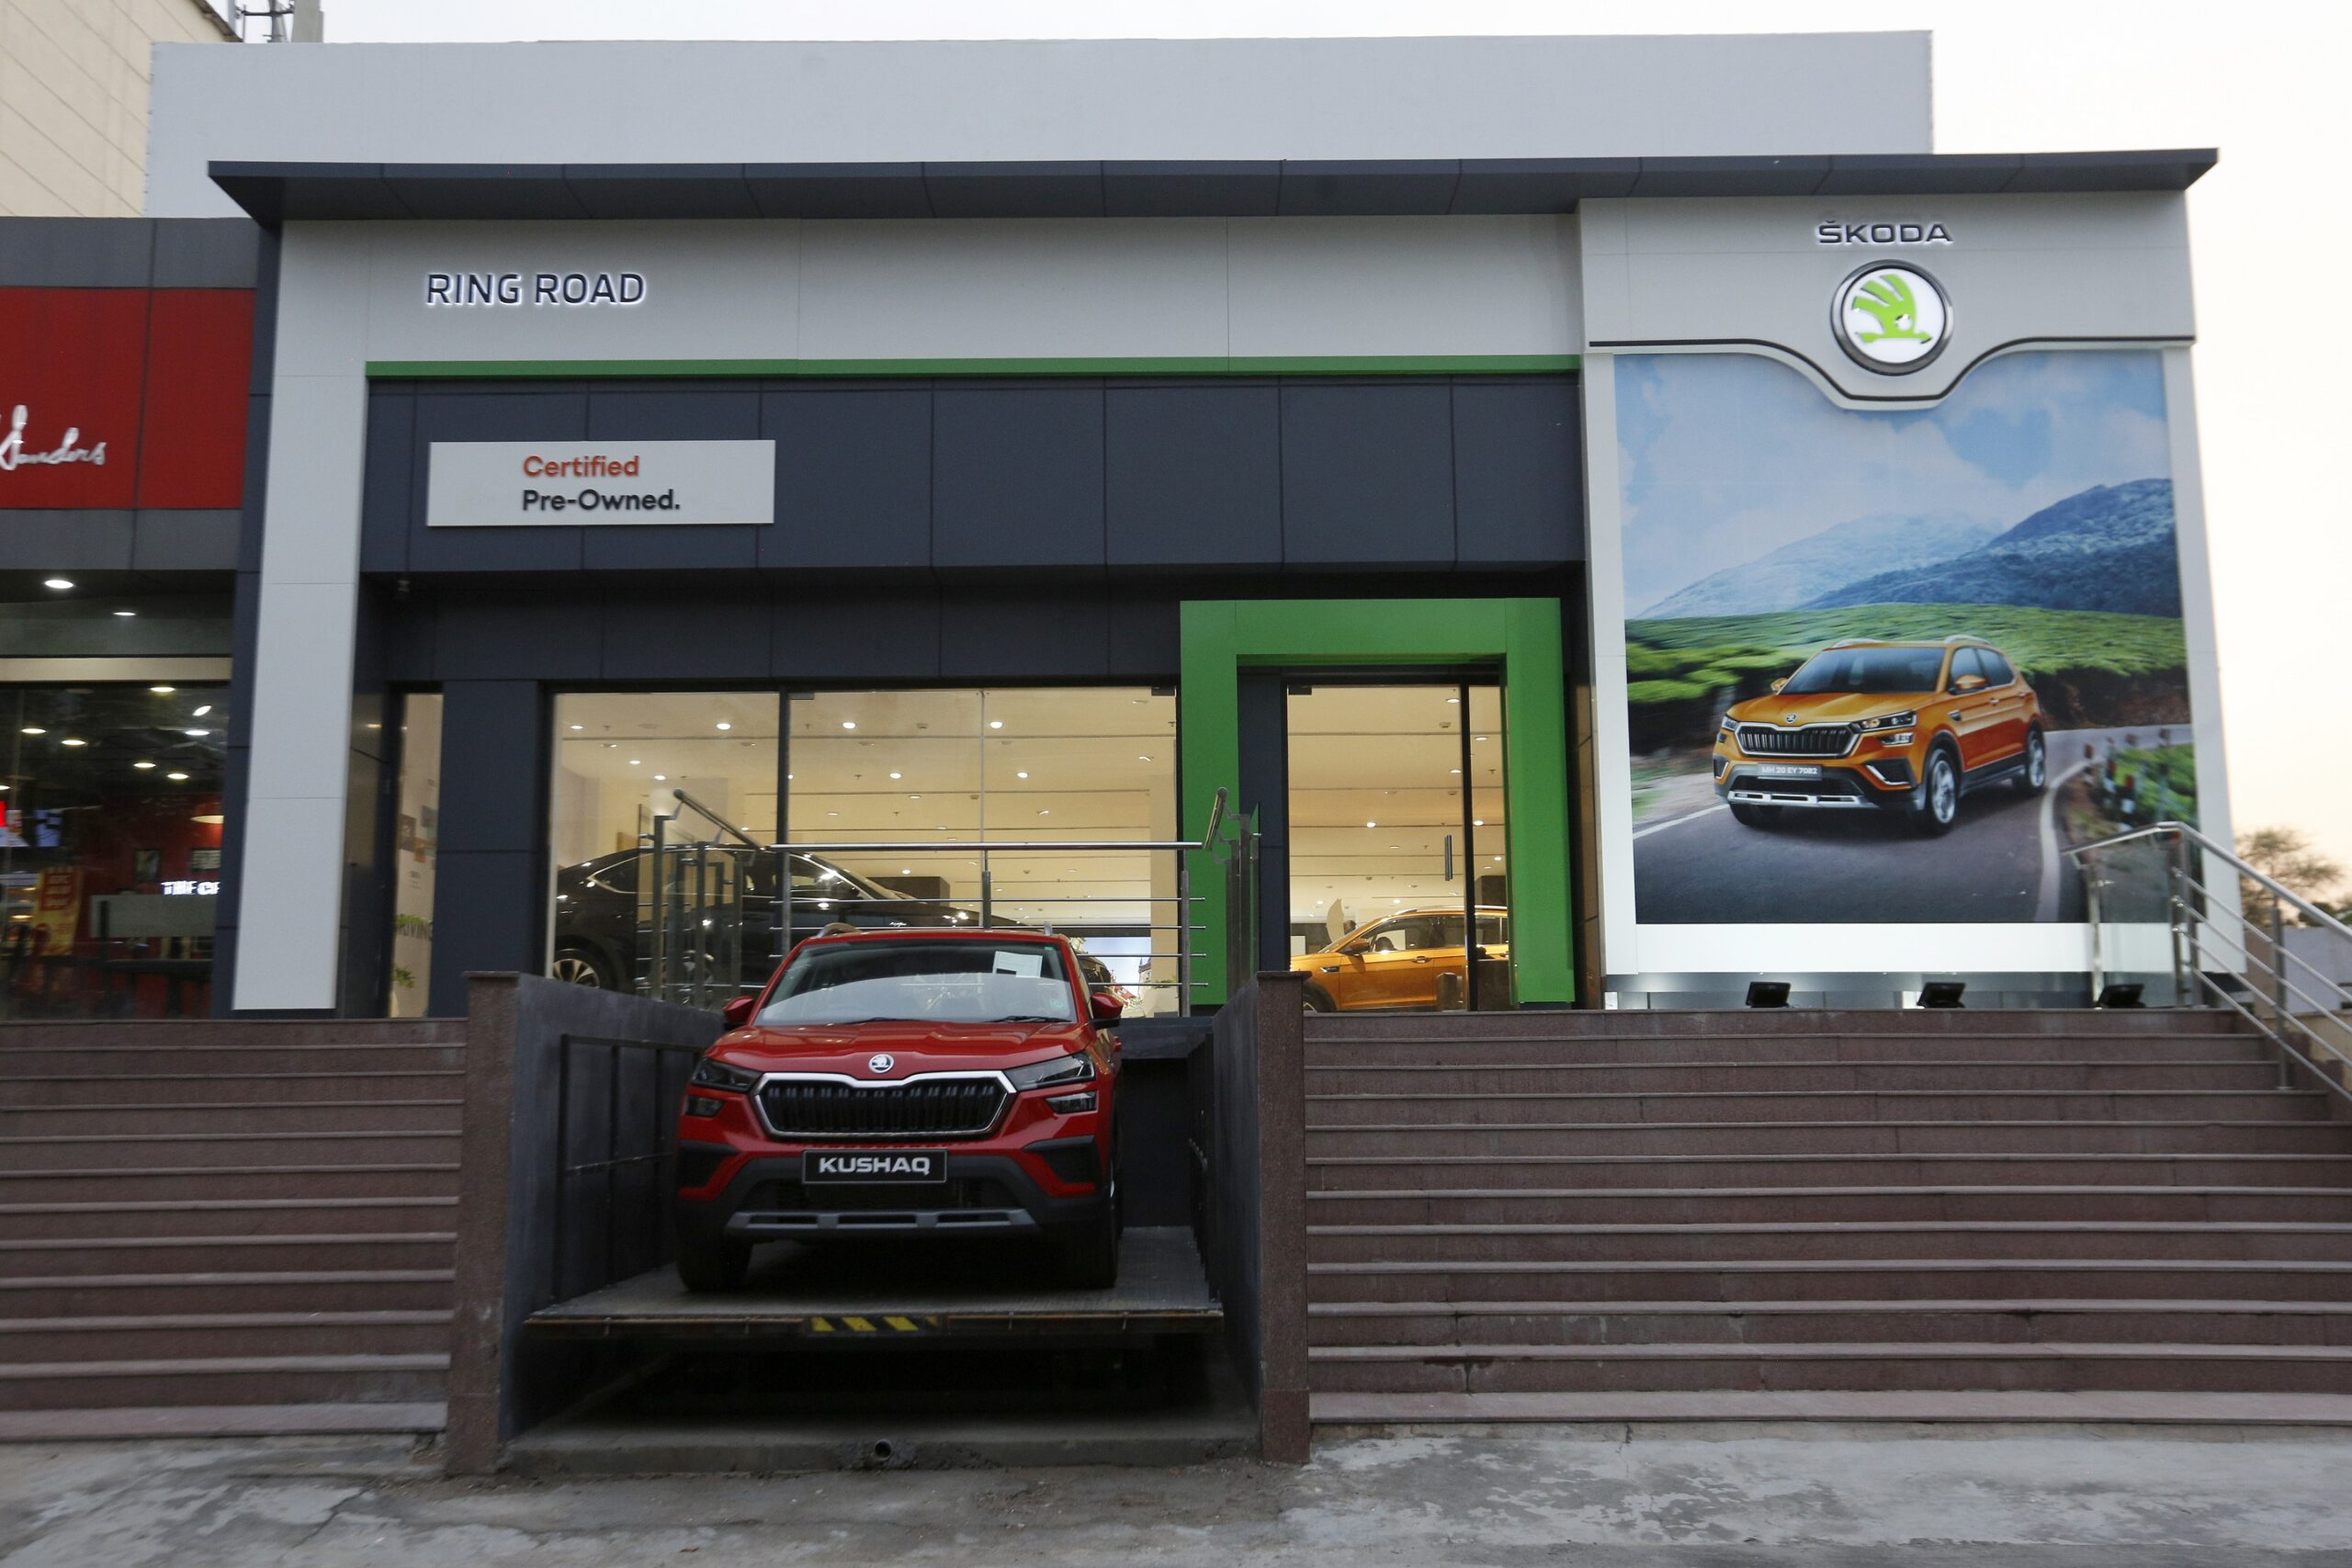 Skoda India expands its footprint